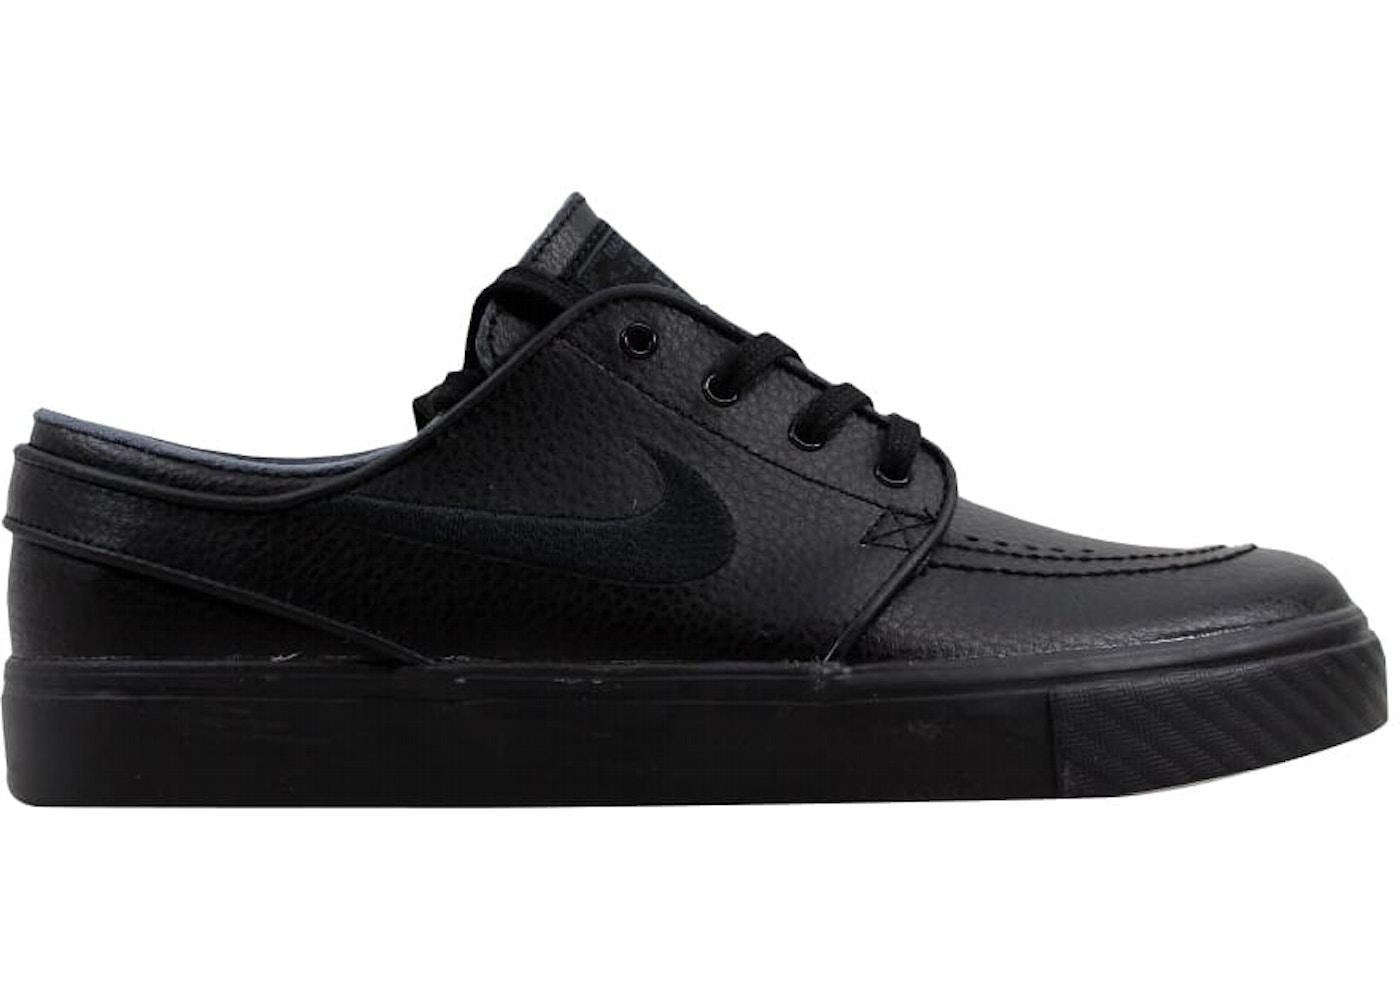 Nike Zoom Stefan Janoski L Black Black-Black-Anthracite - 616490-006 fbddf25e9